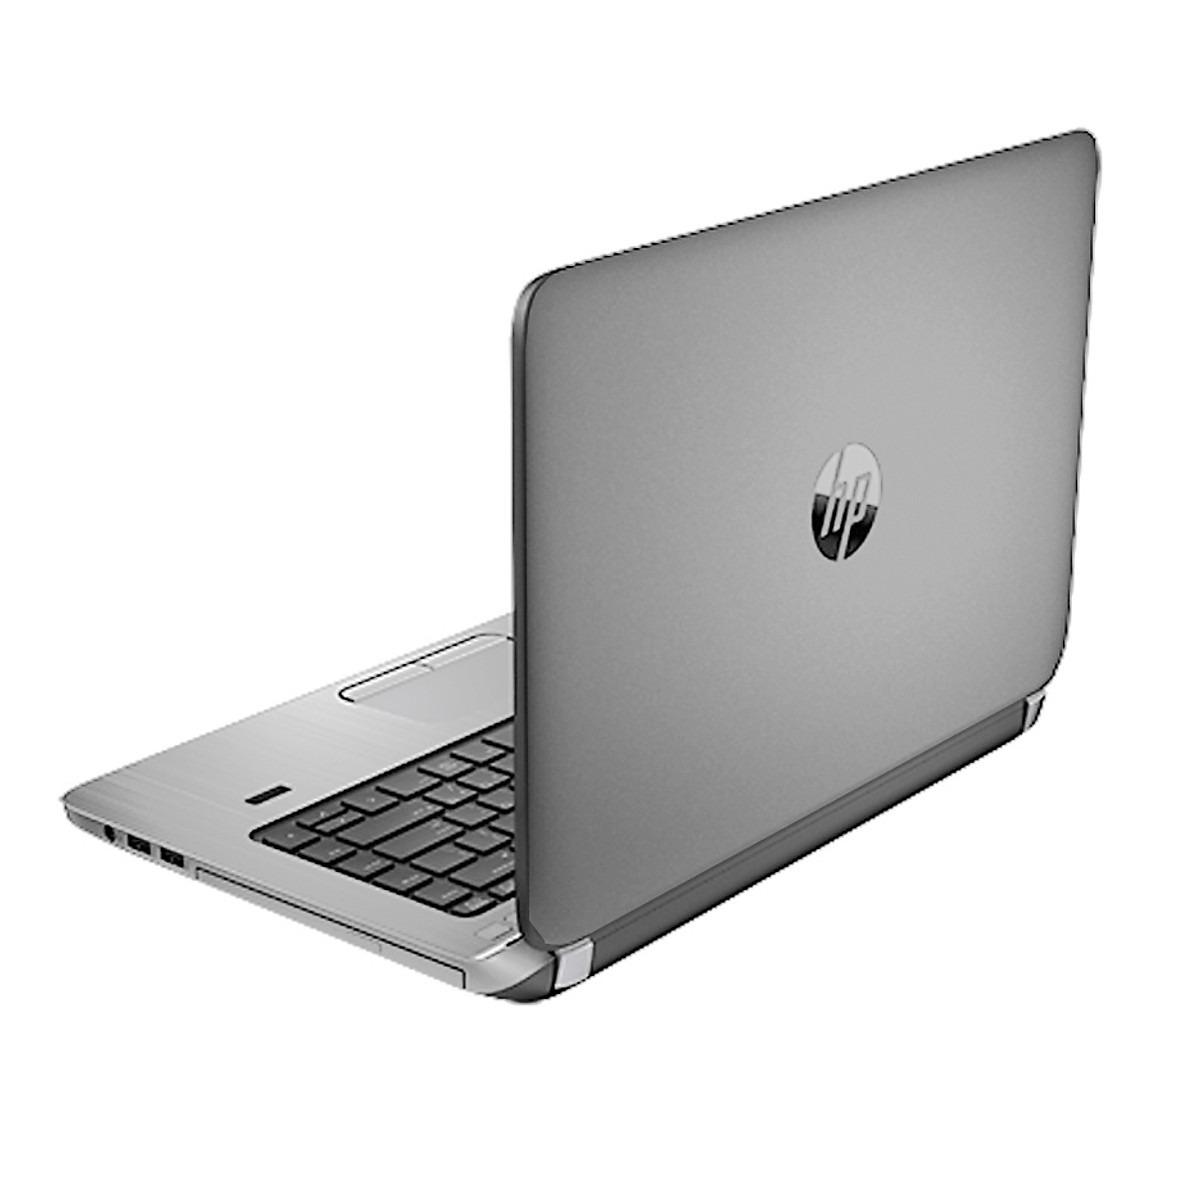 hp-probook-440-g2_1629719415.jpg